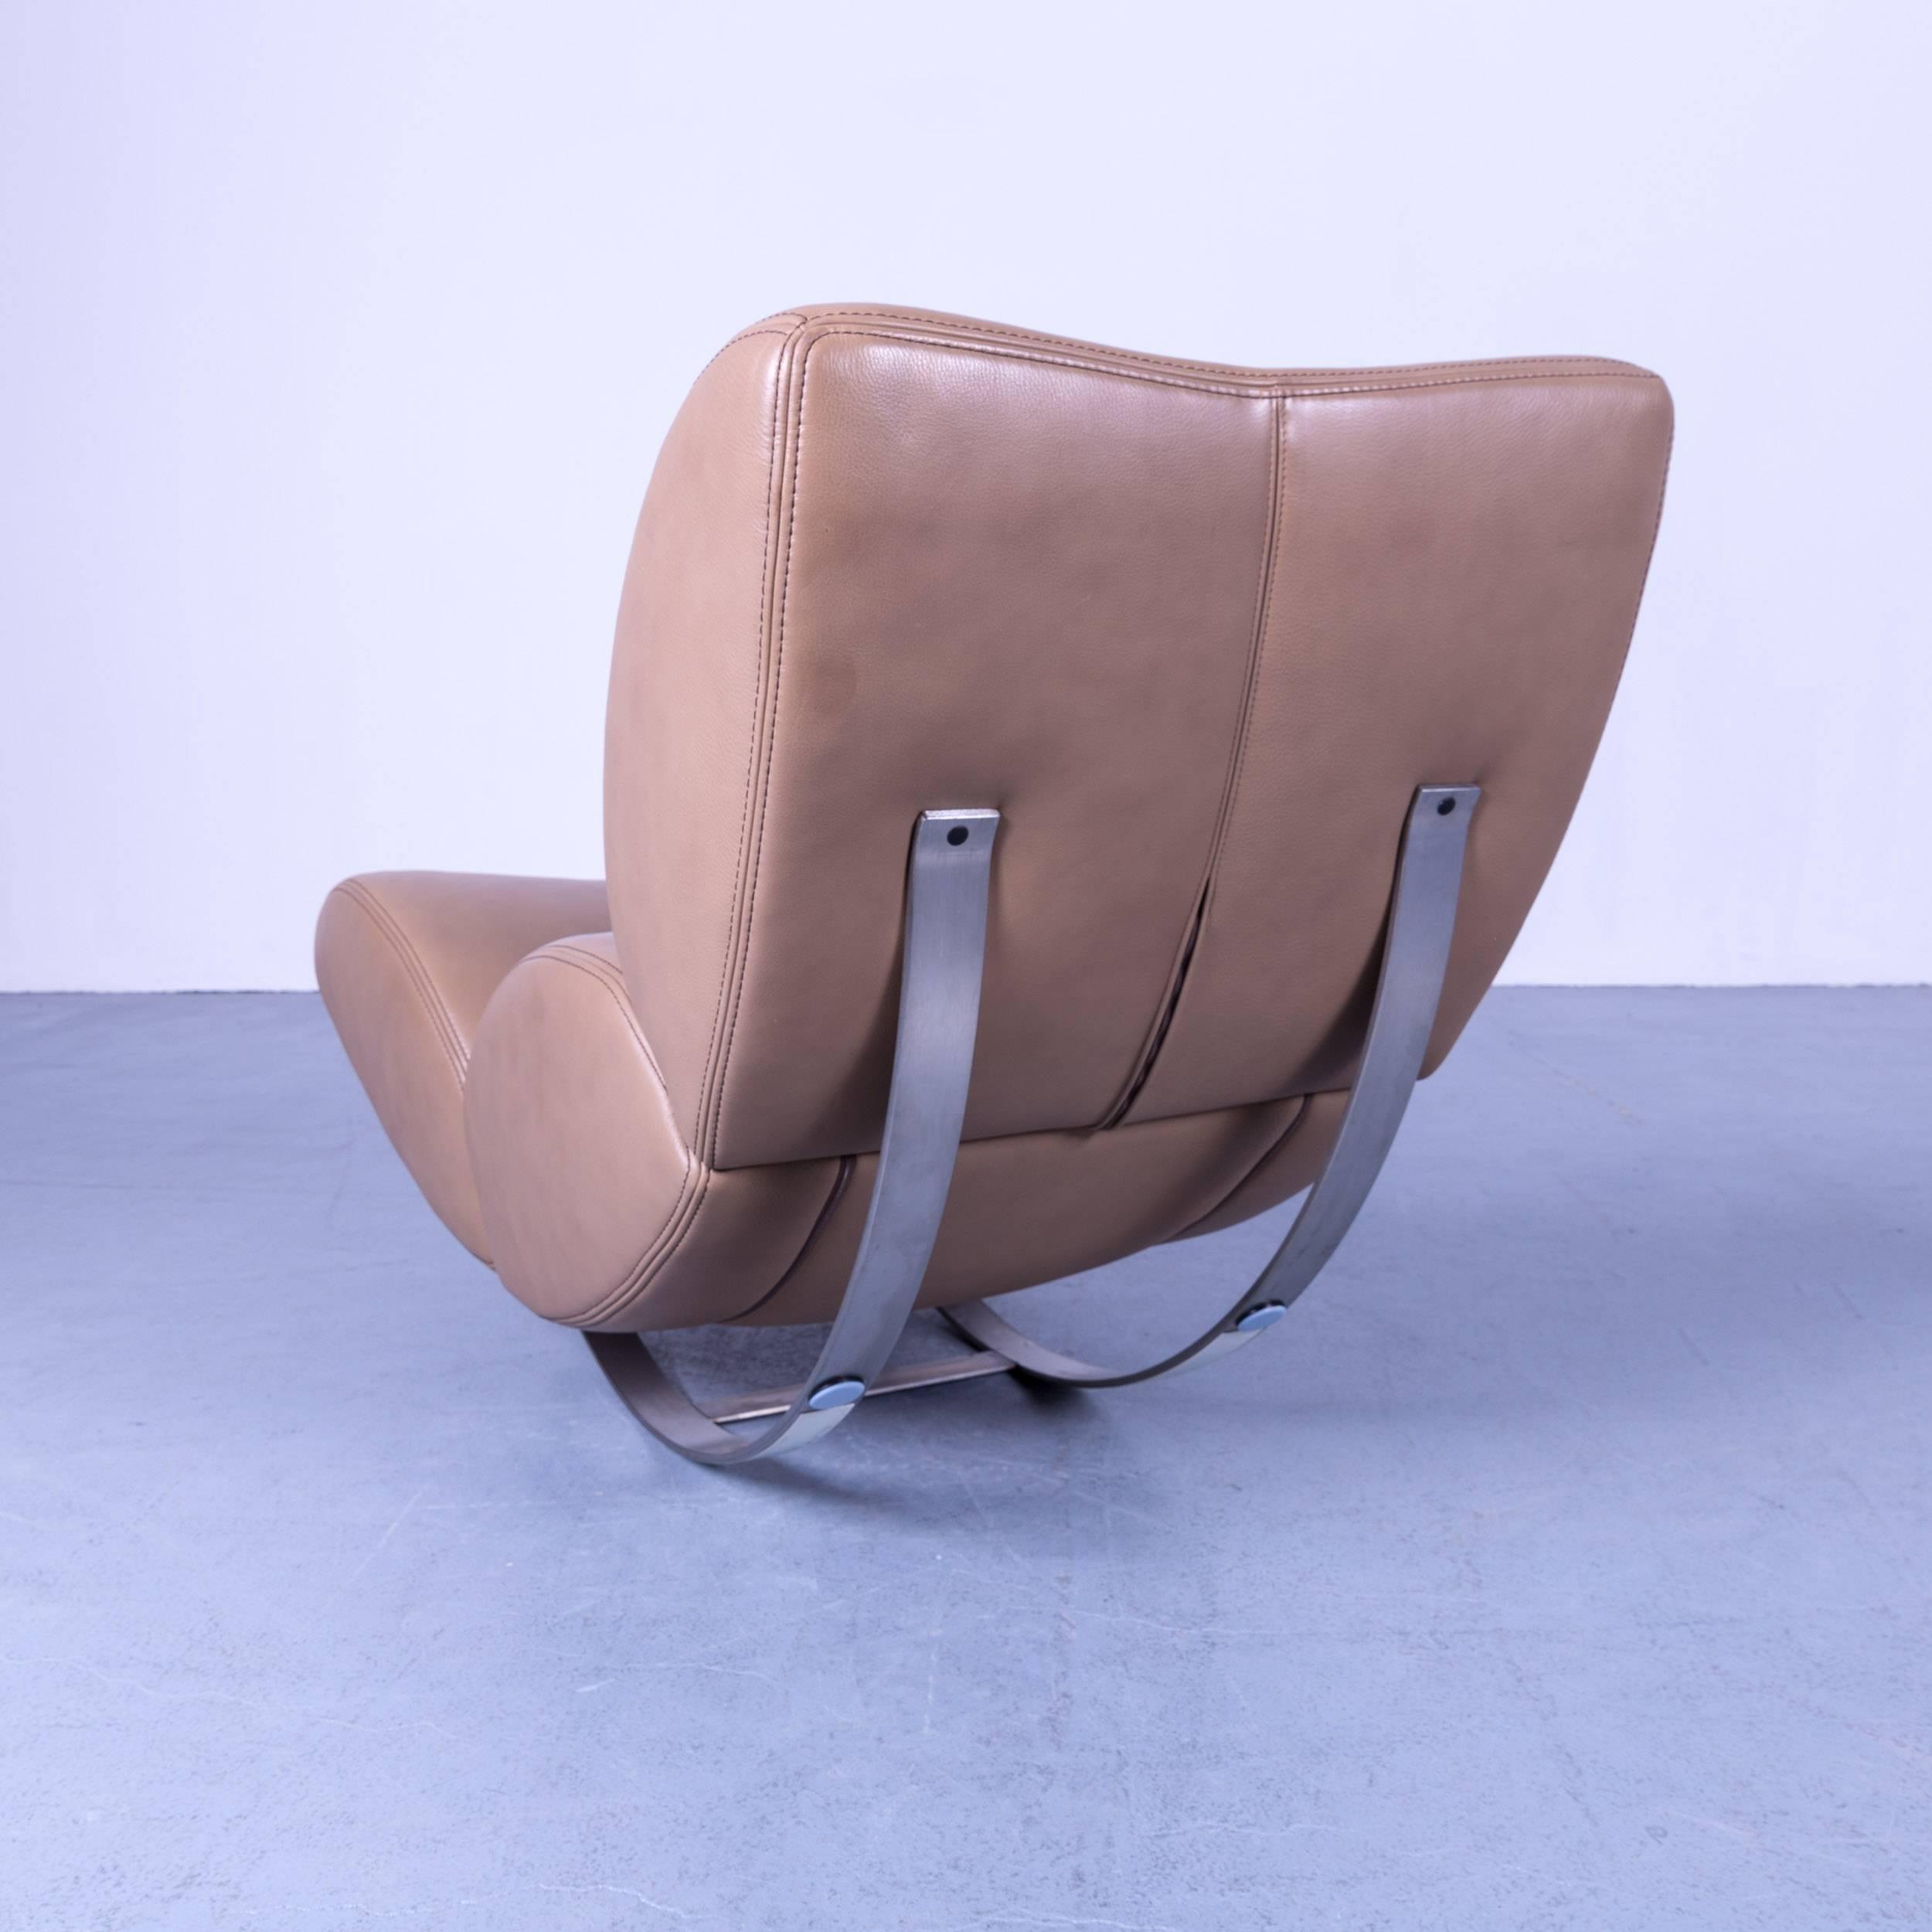 Koinor Jetlag Designer Rocking Chair Beige Creme Leather One Seat